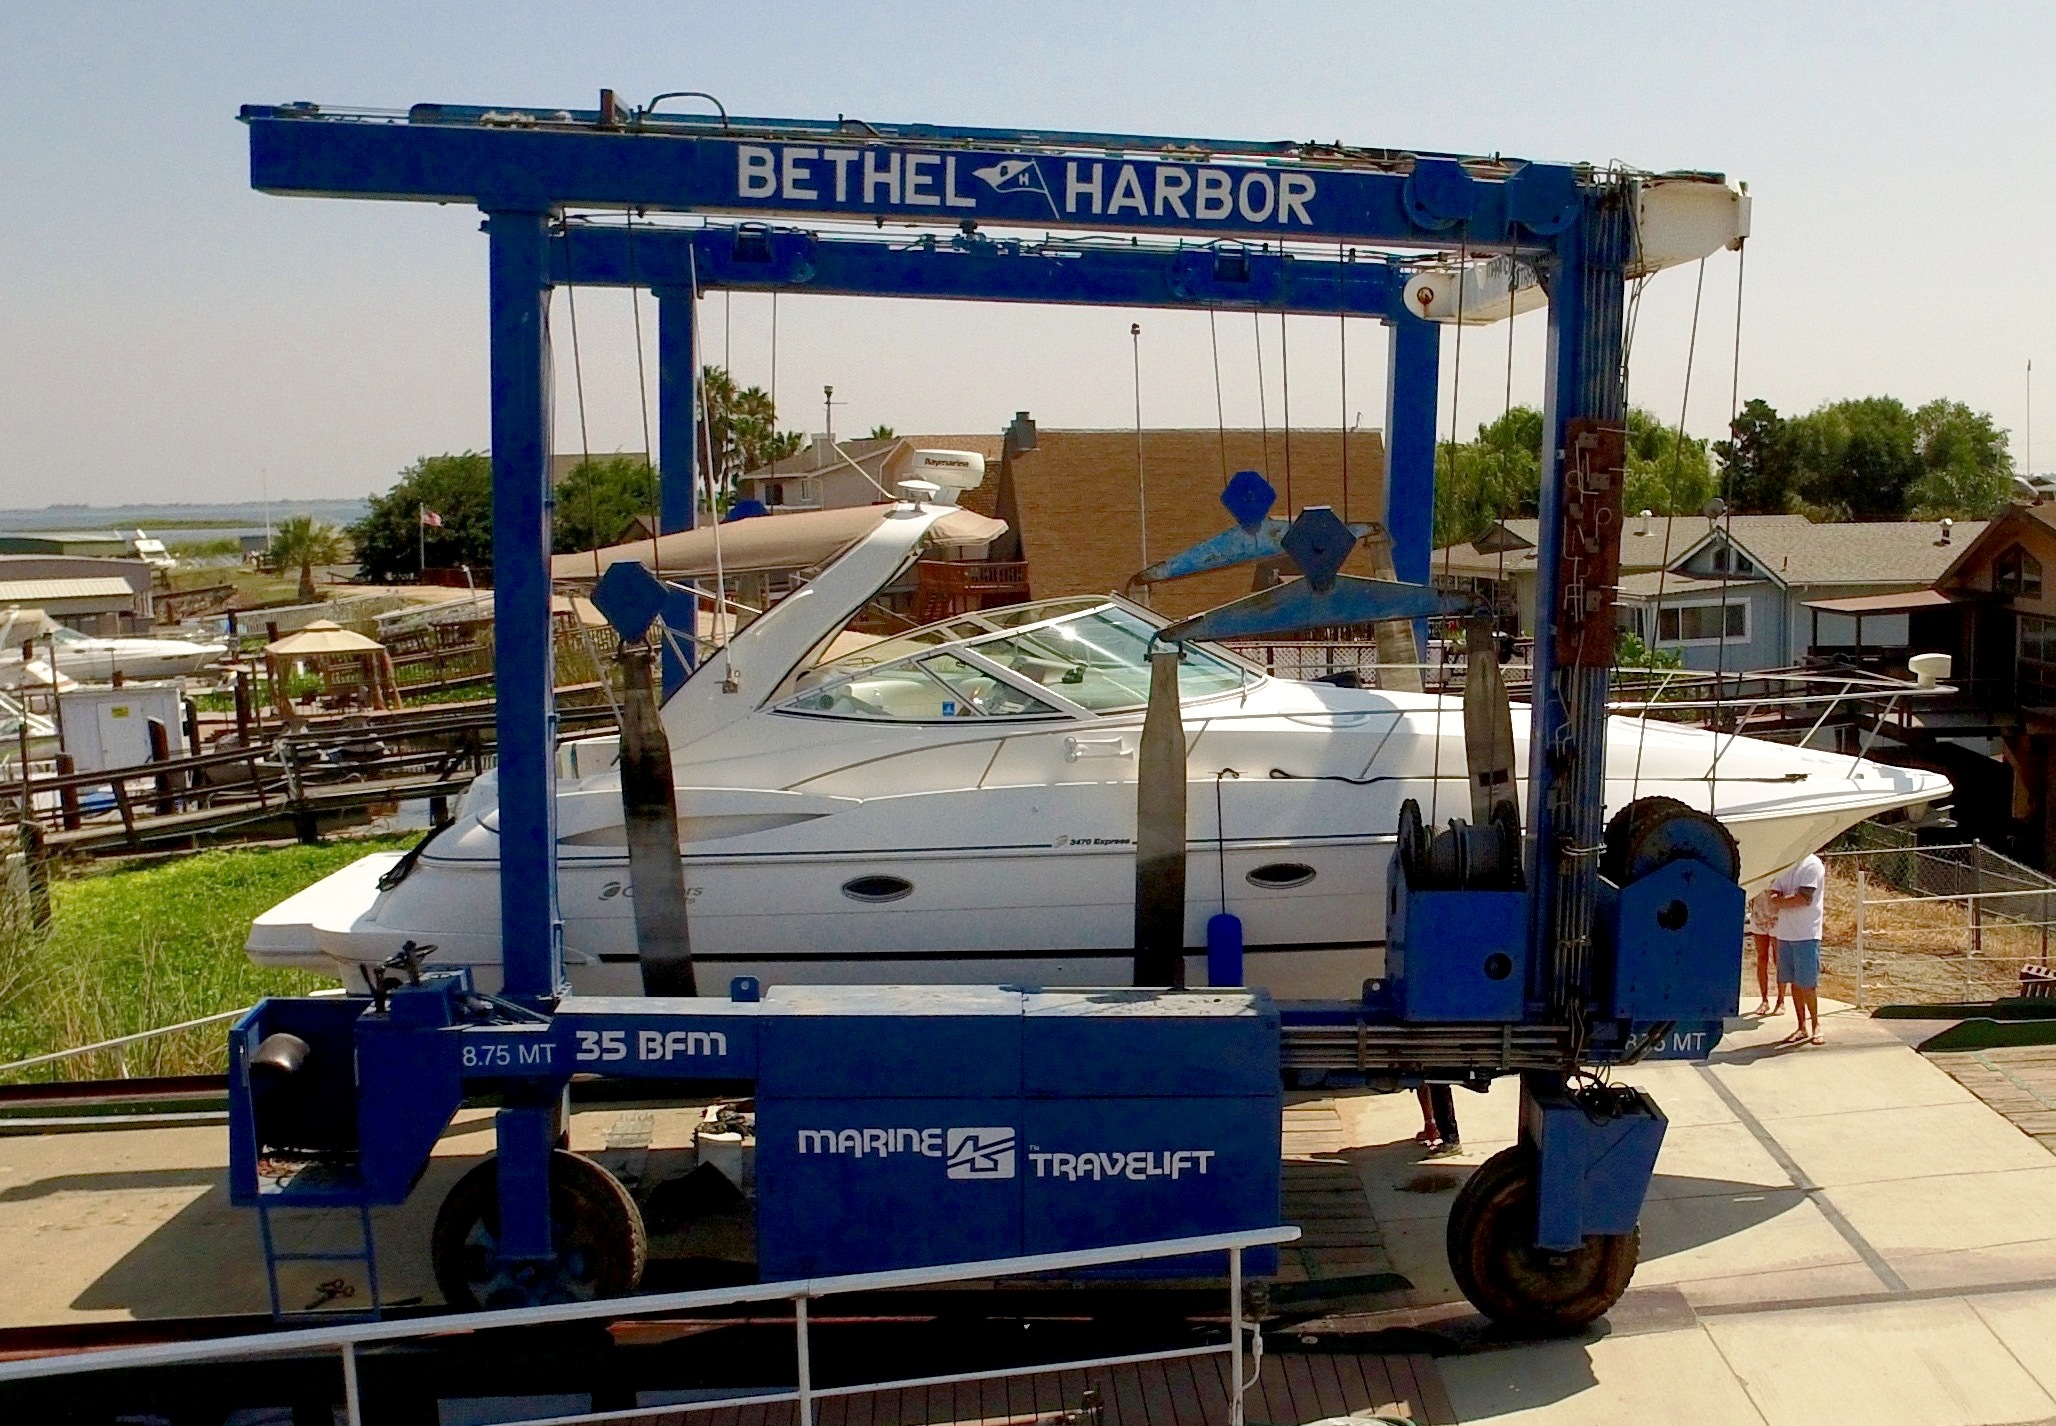 bethel-harbor-store-boat-yard.jpg